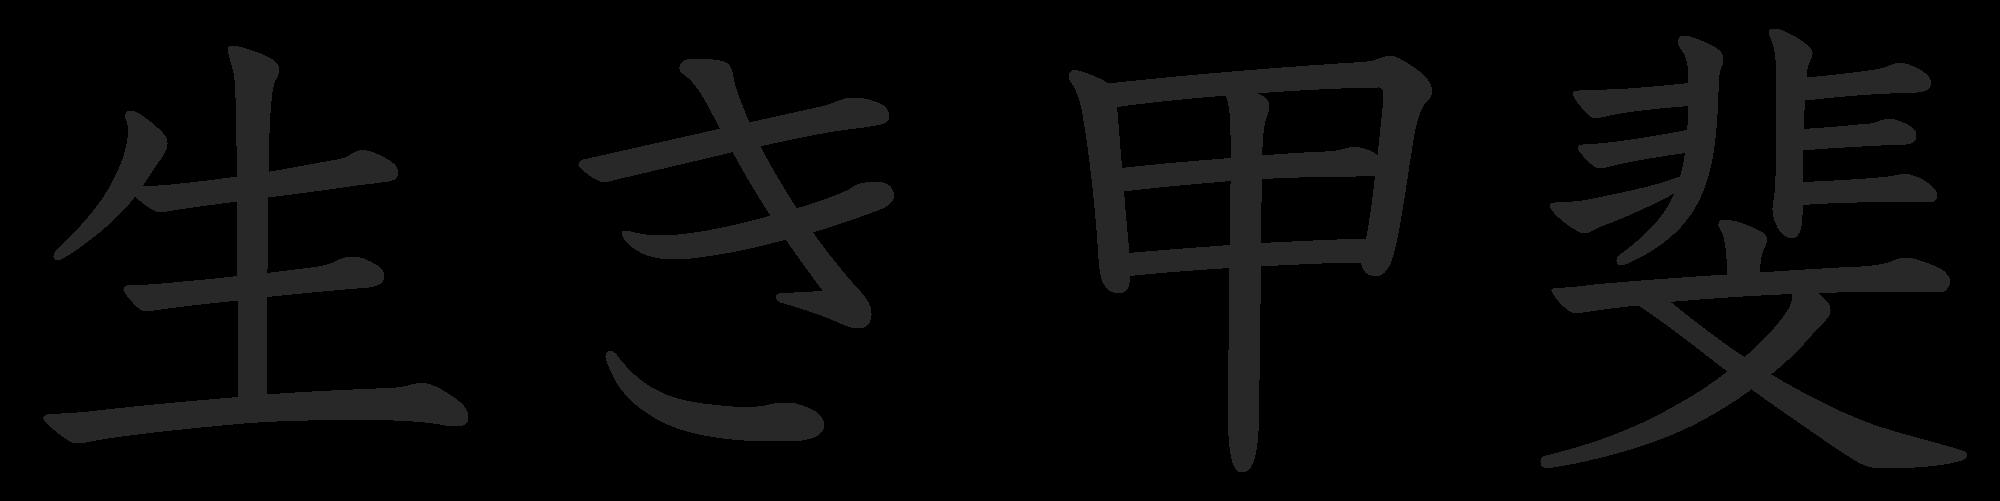 Ikigai Questionnaire